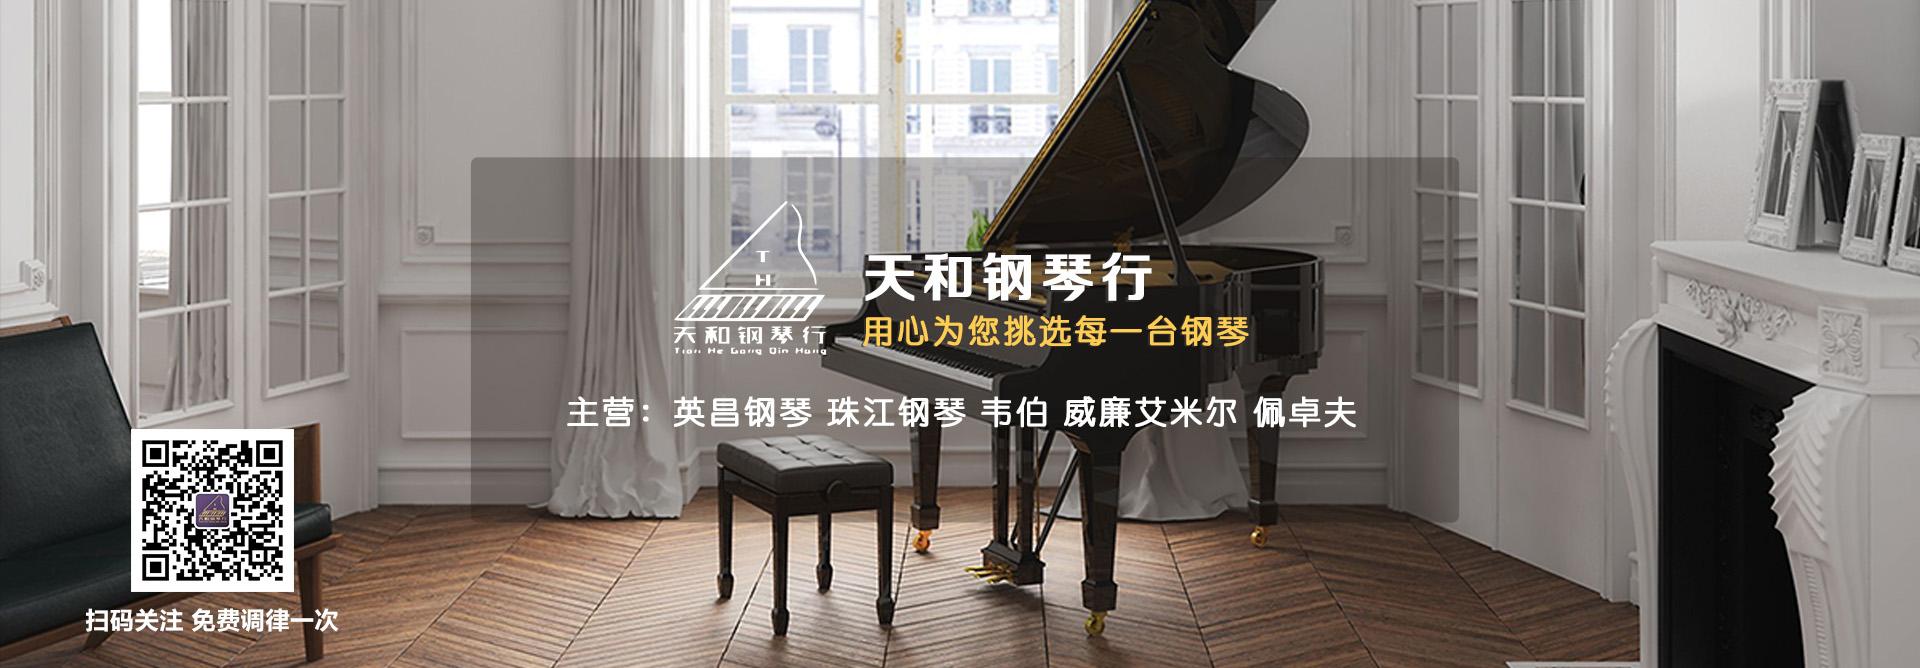 天津买钢琴